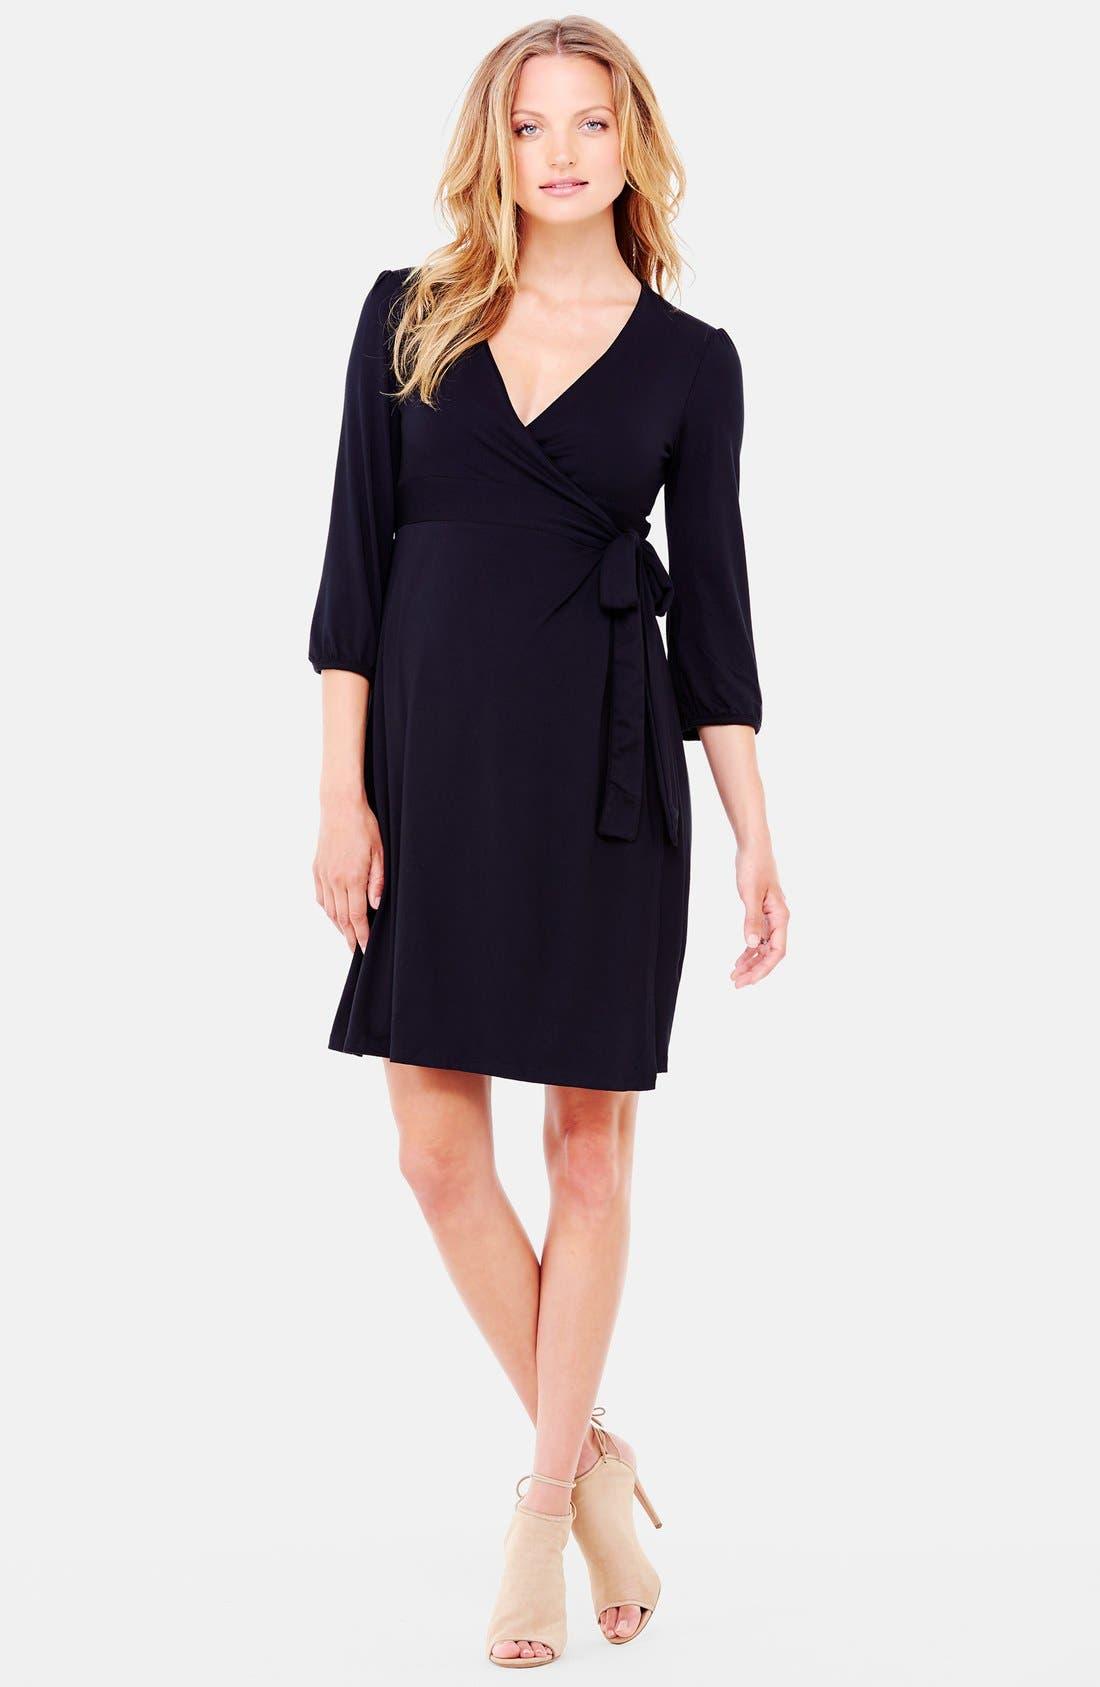 Nursing Friendly Maternity Wrap Dress,                             Main thumbnail 1, color,                             Jet Black